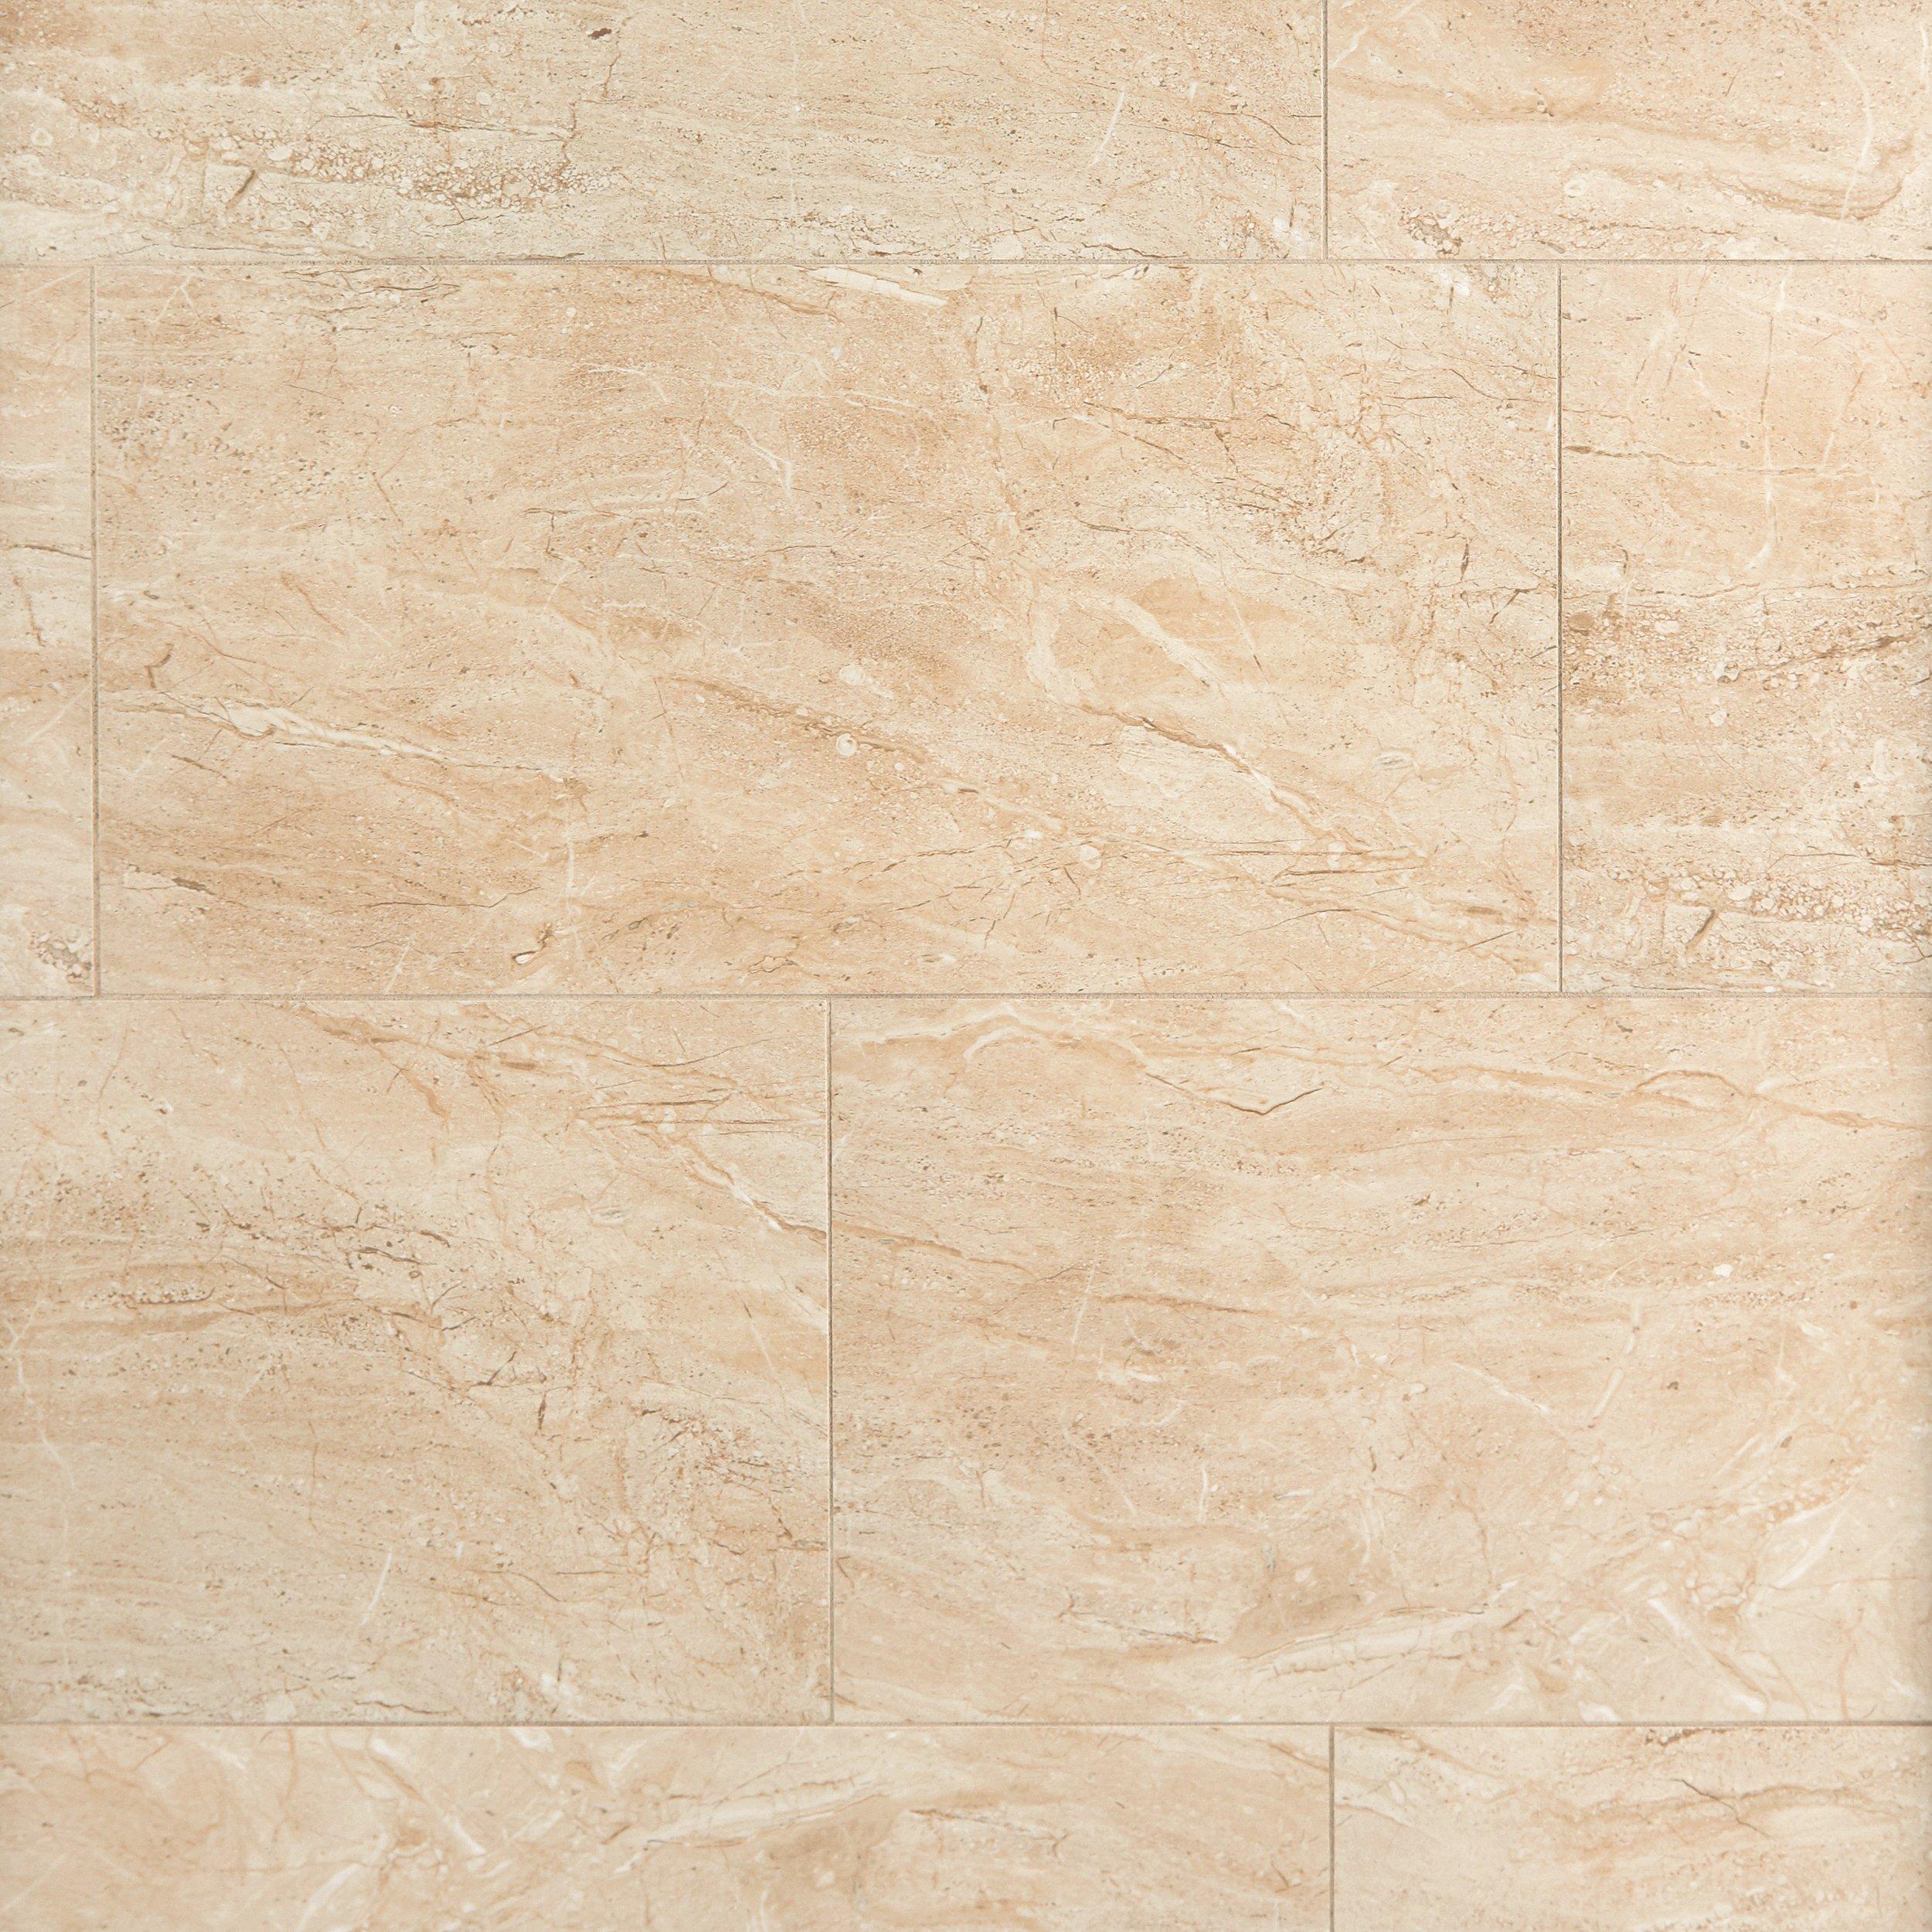 Polishedhigh gloss look tile floor decor luxor polished porcelain tile dailygadgetfo Choice Image